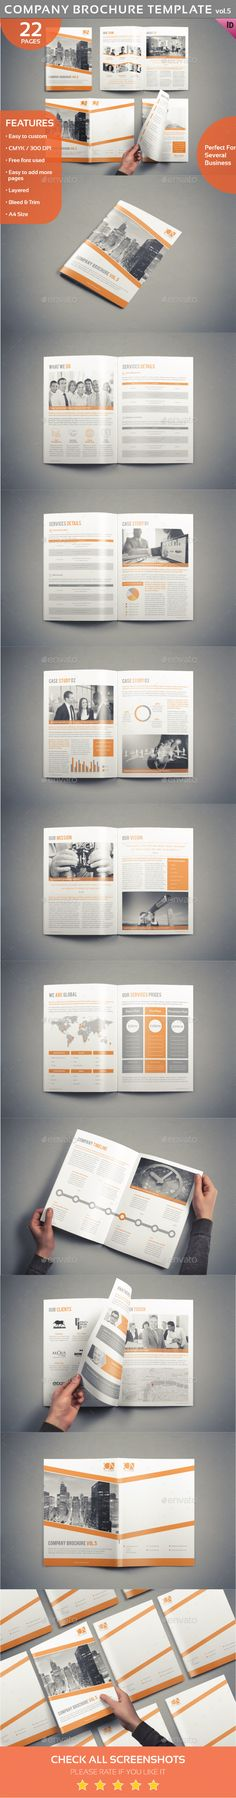 Interior Design Square 3-Fold Brochure V08 Brochures, Brochure - company brochure templates